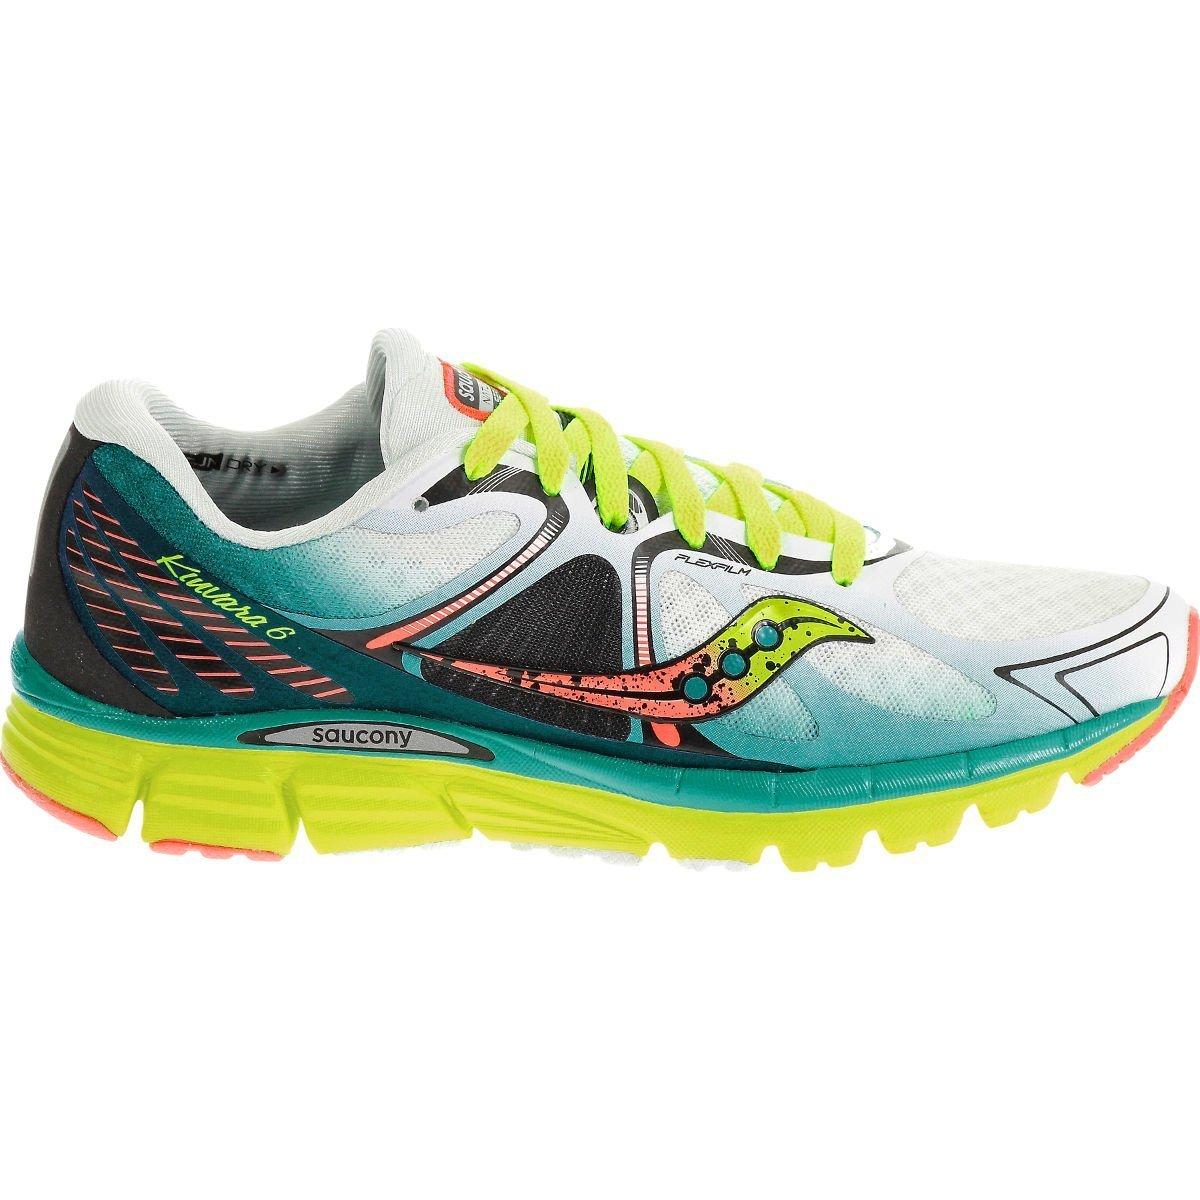 Saucony Women's Kinvara 6 Running Shoe, White/Blue/Coral, 9 M US